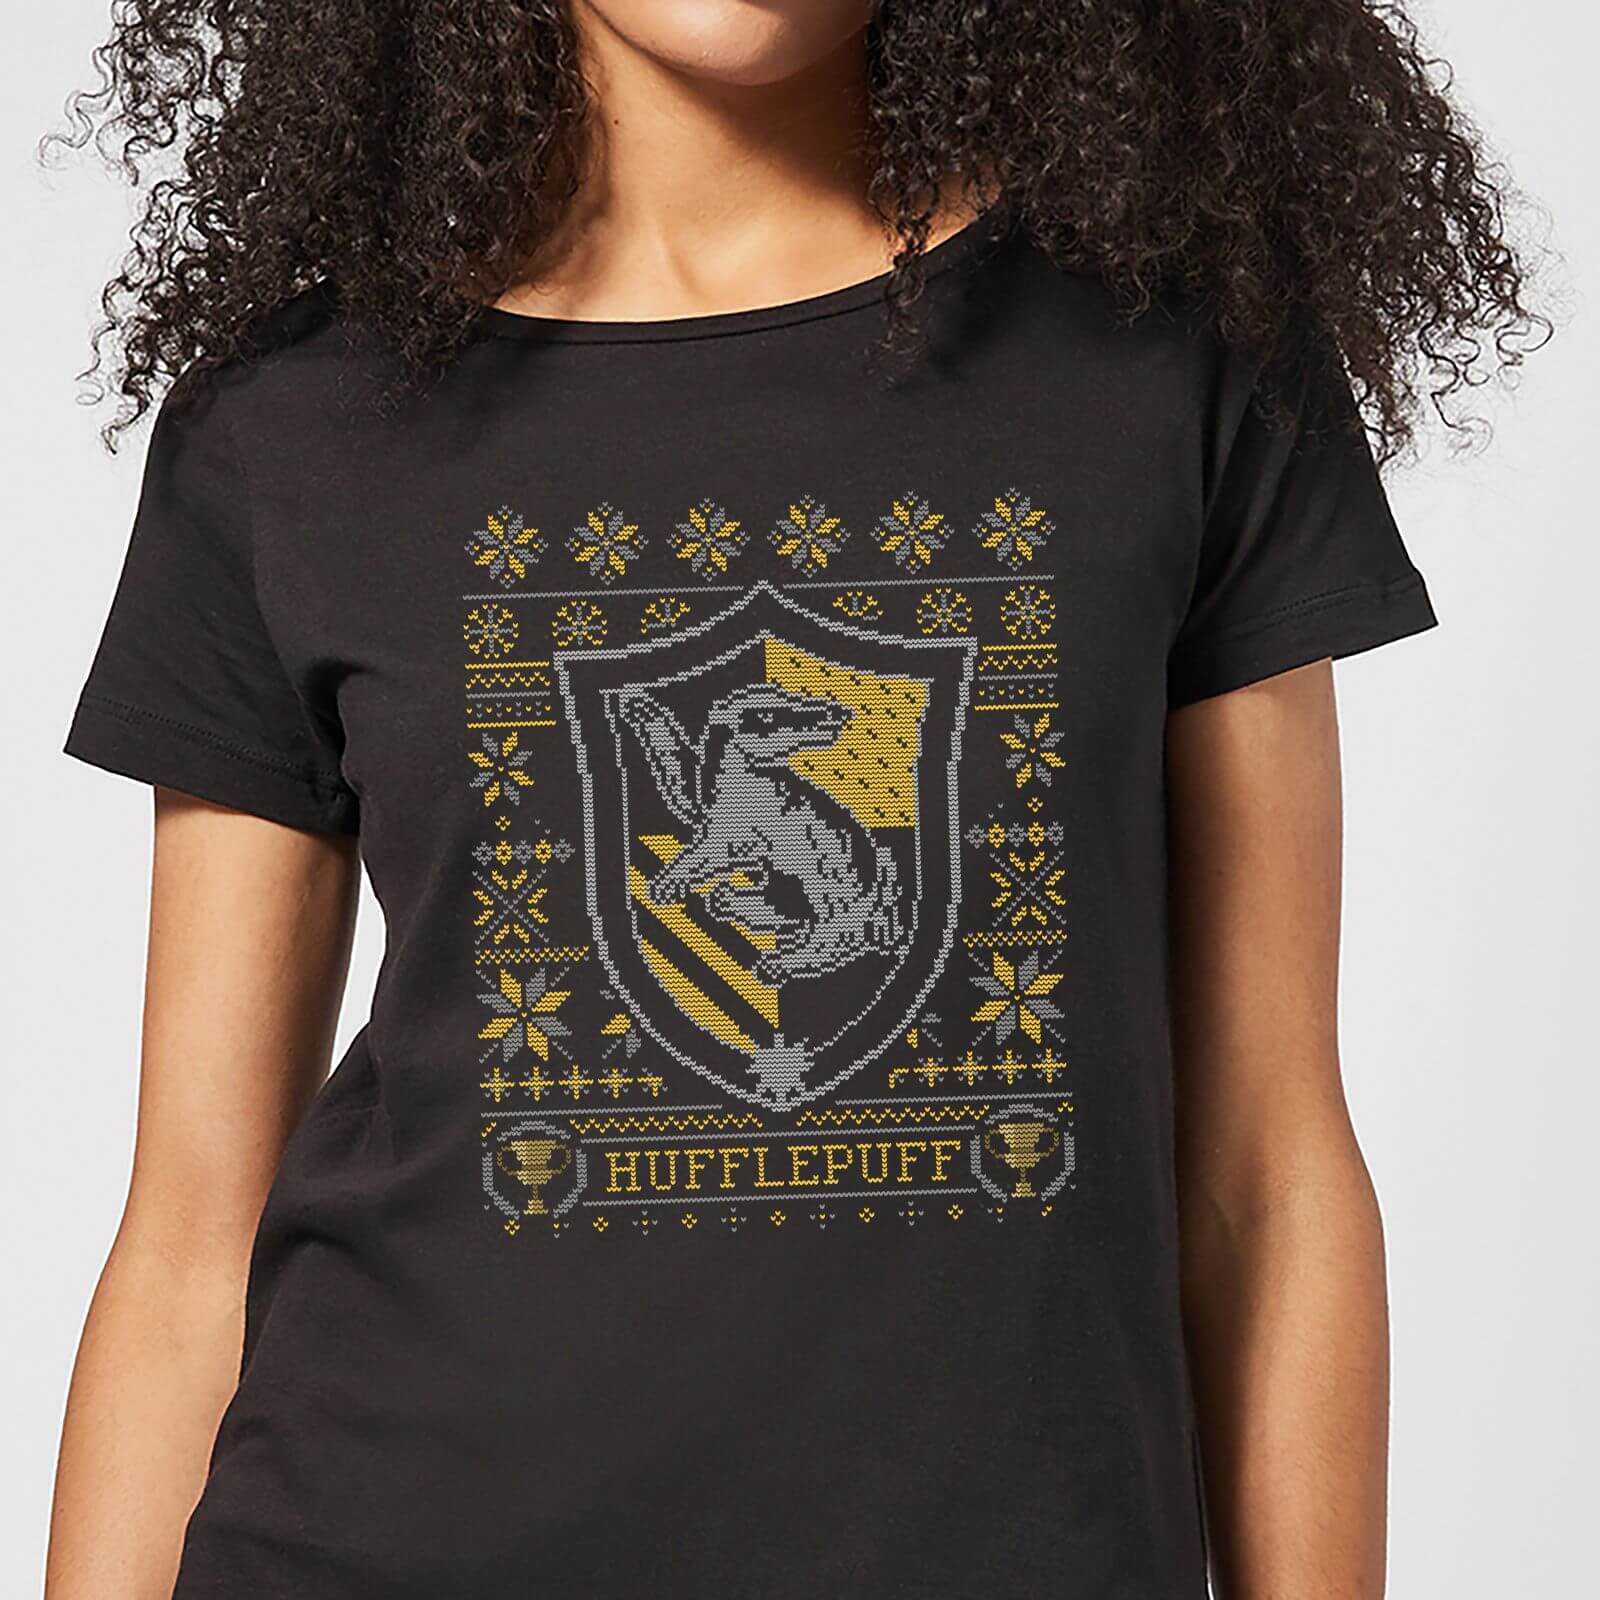 736bdf7d Harry Potter Hufflepuff Crest Women's Christmas T-Shirt - Black Clothing    Zavvi